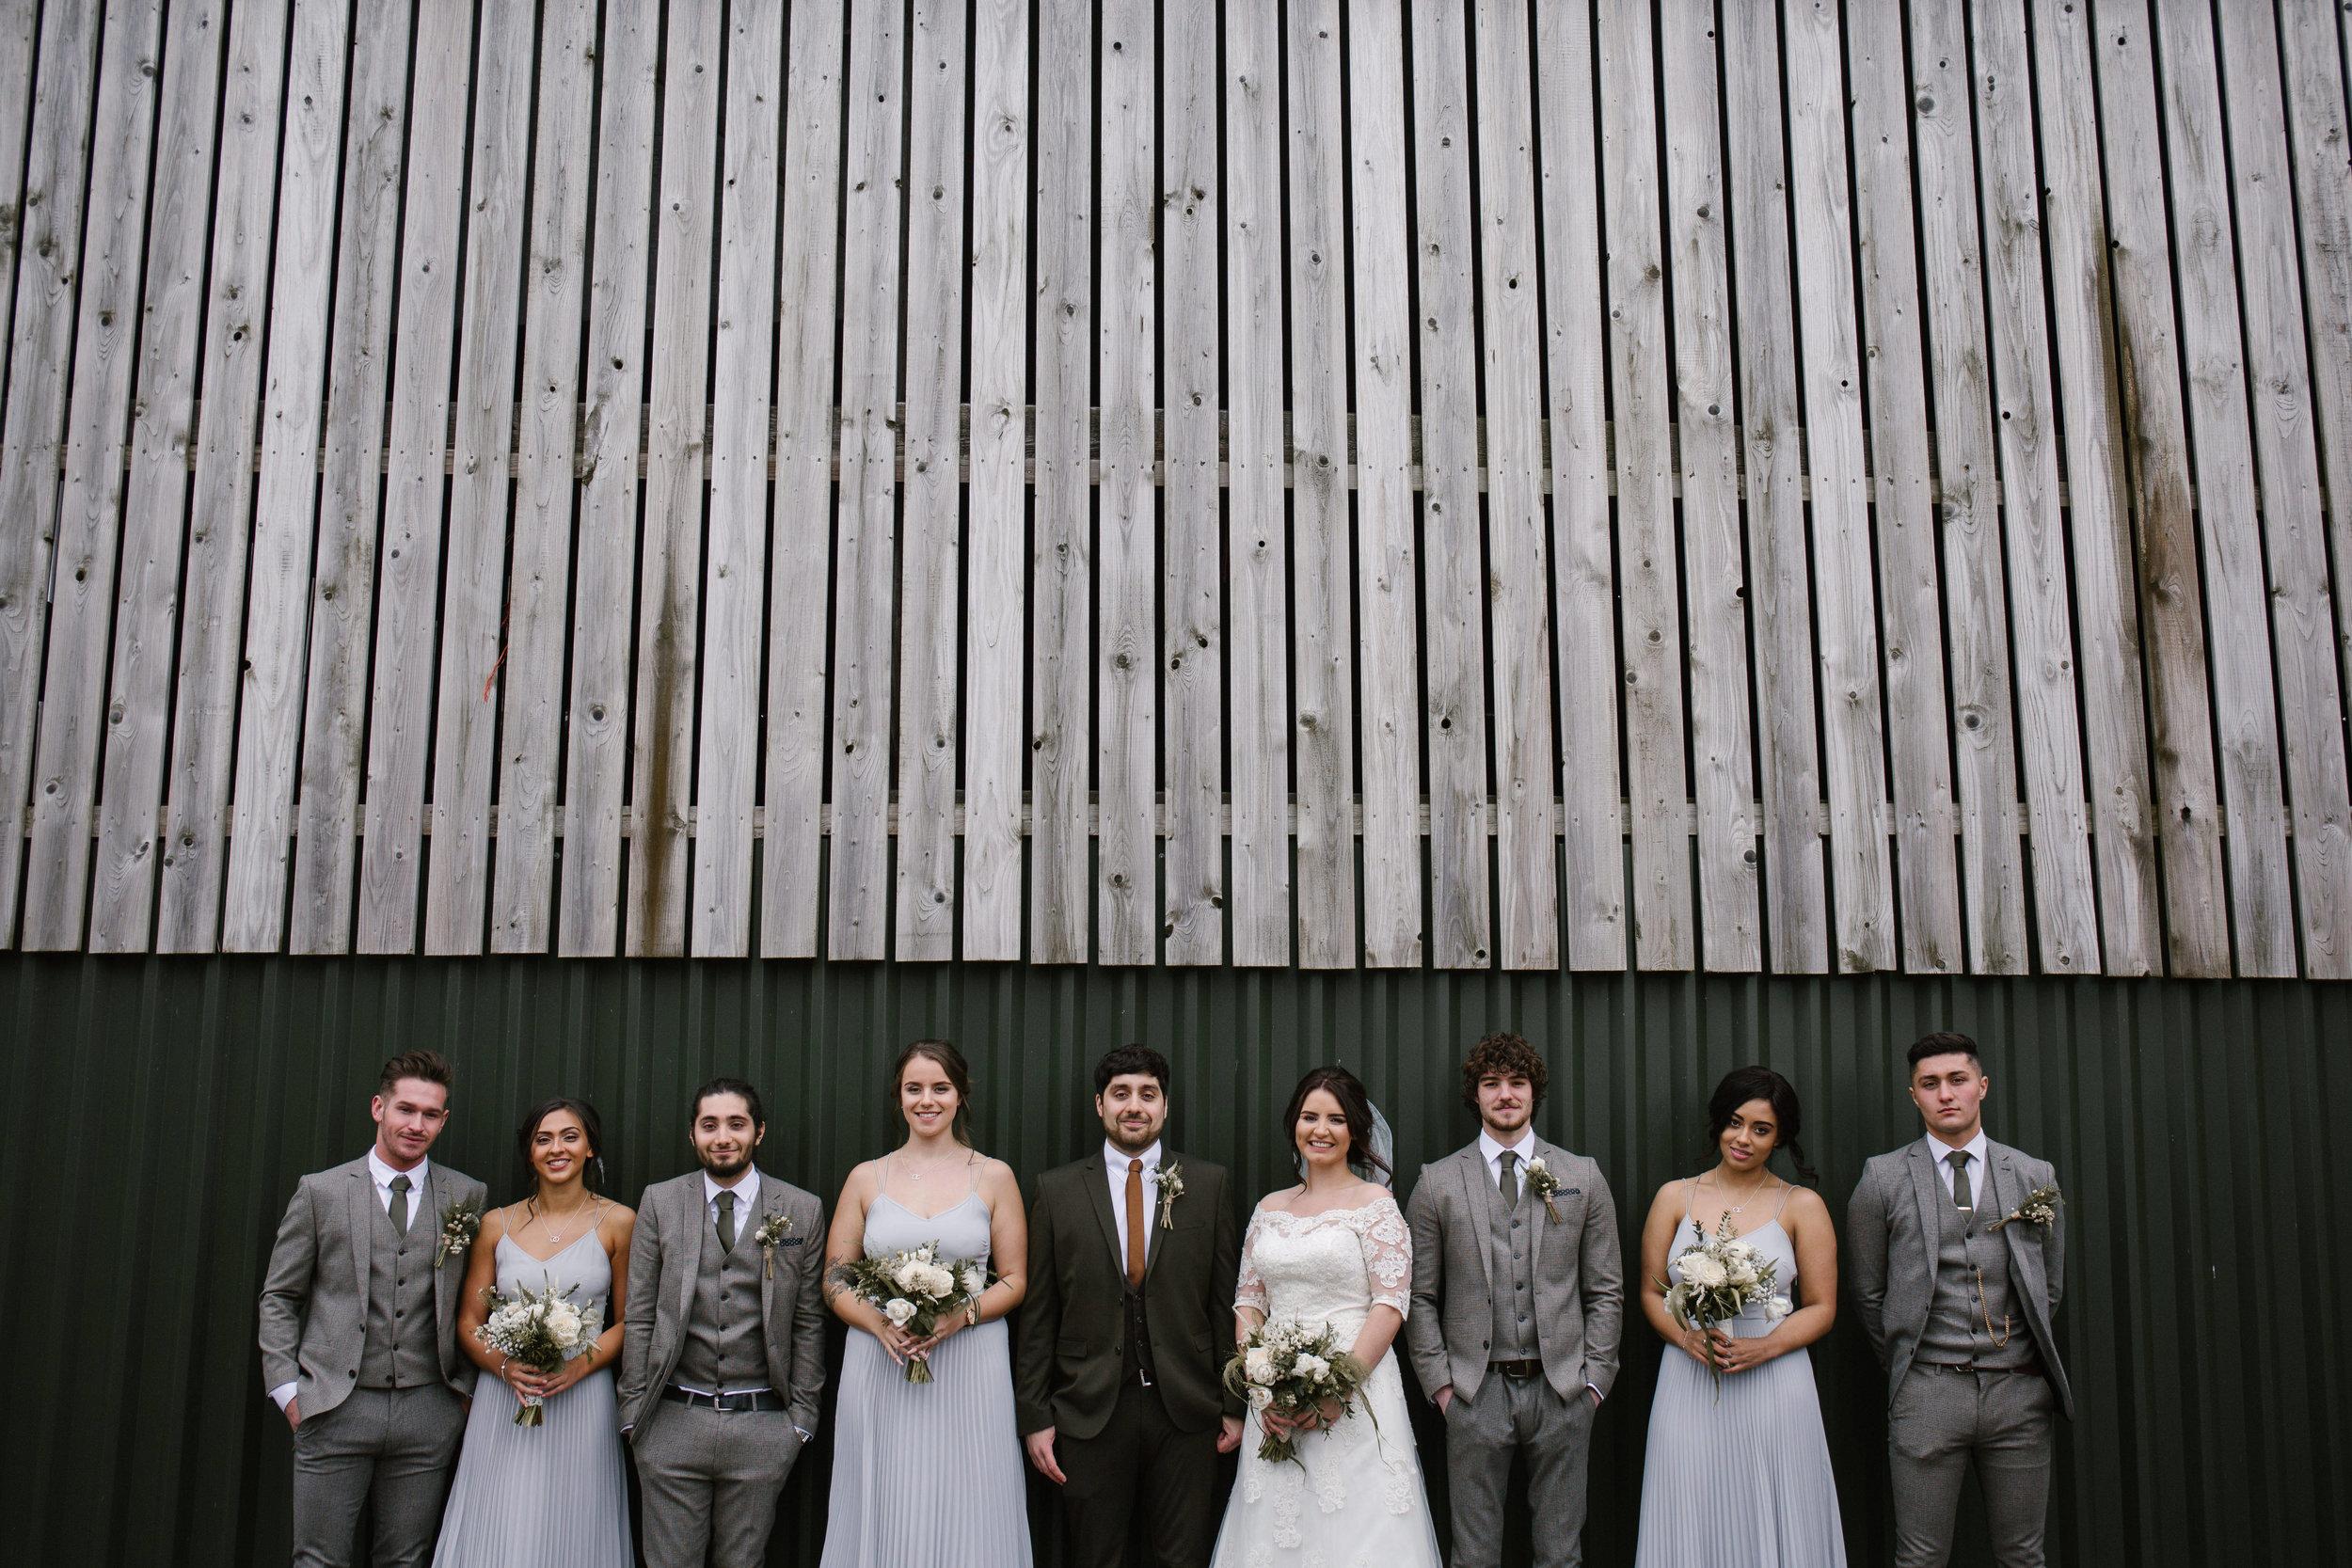 Sandhole Oak Barn, Rustic Wedding, DIY Wedding, Manchester wedding photographer, Birmingham wedding photographer, barn wedding-171.jpg